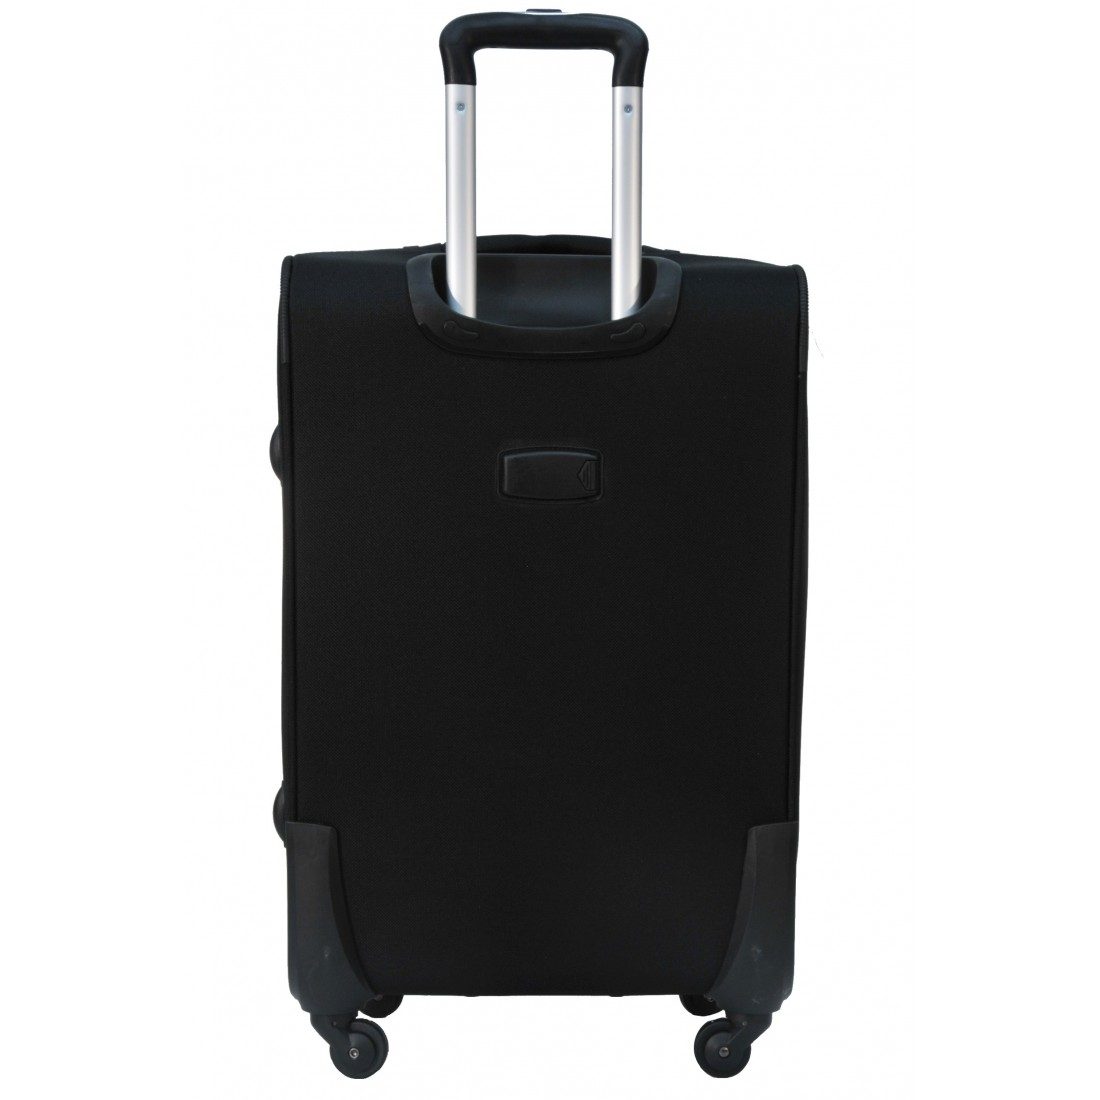 Walizka średnia czarna Premium - plecak-tornister.pl